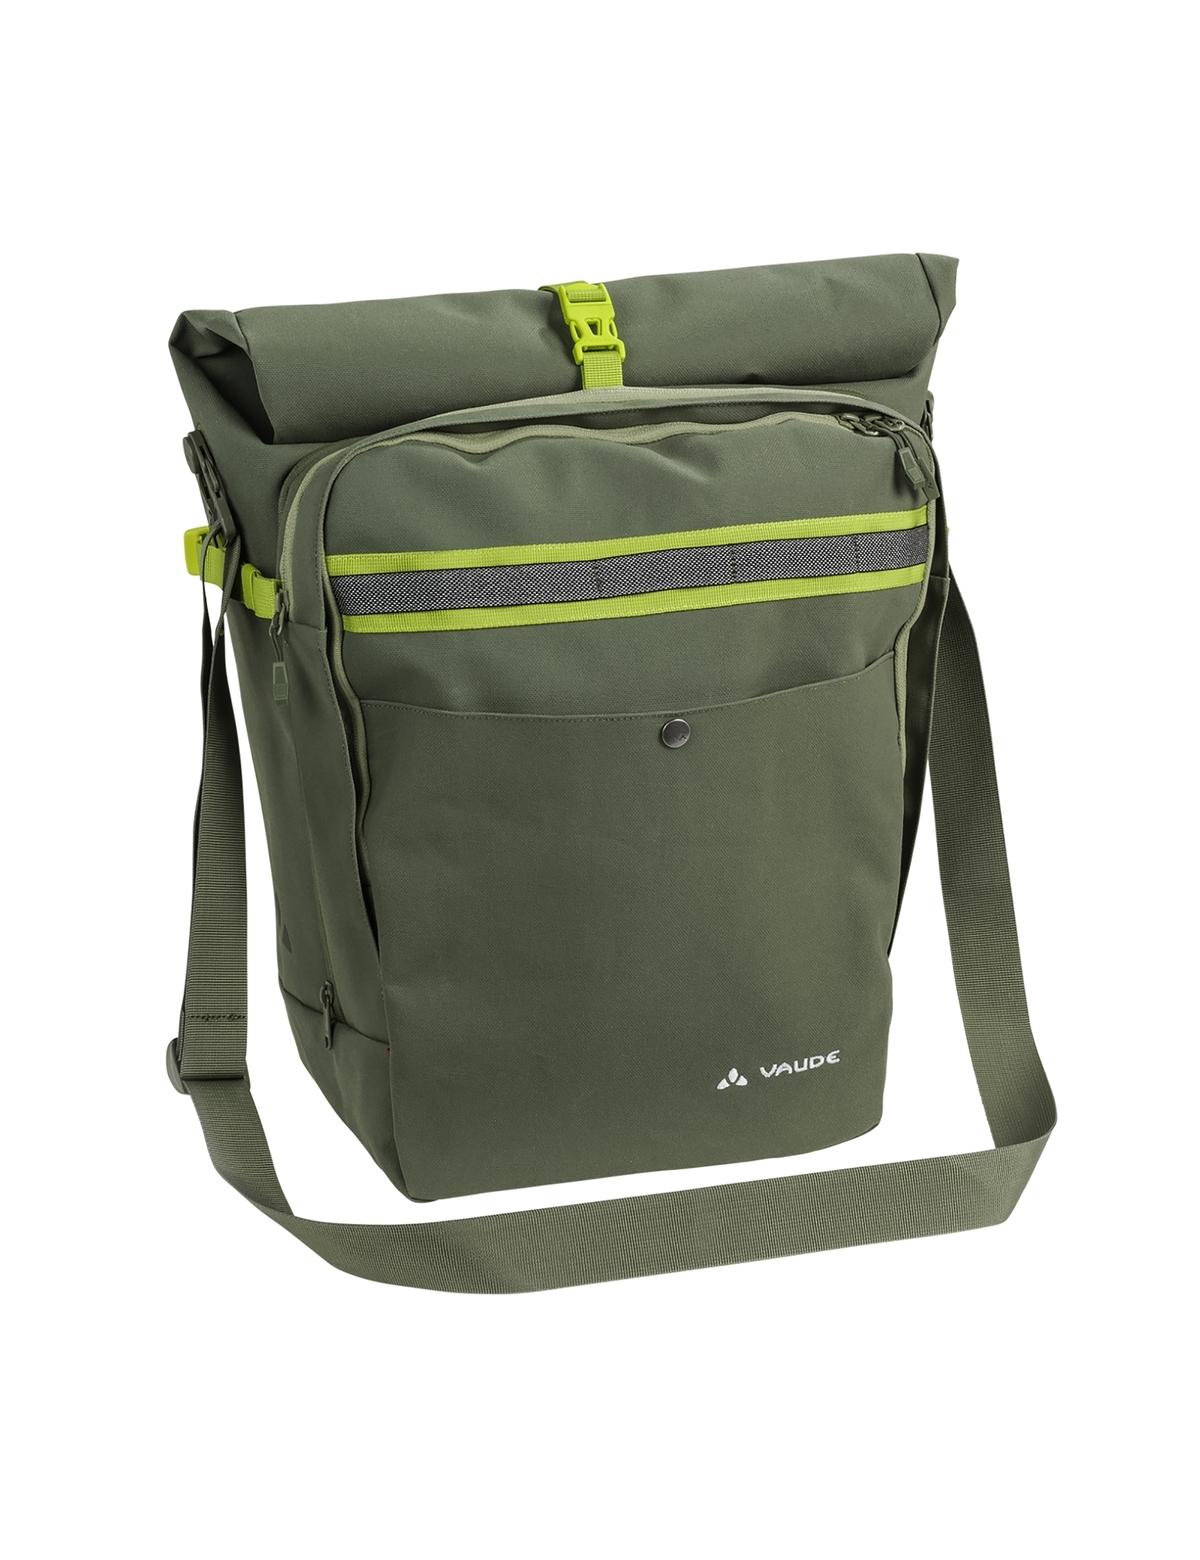 Sacoche porte-bagages Vaude ExCycling Back 45 L Vert Cèdre